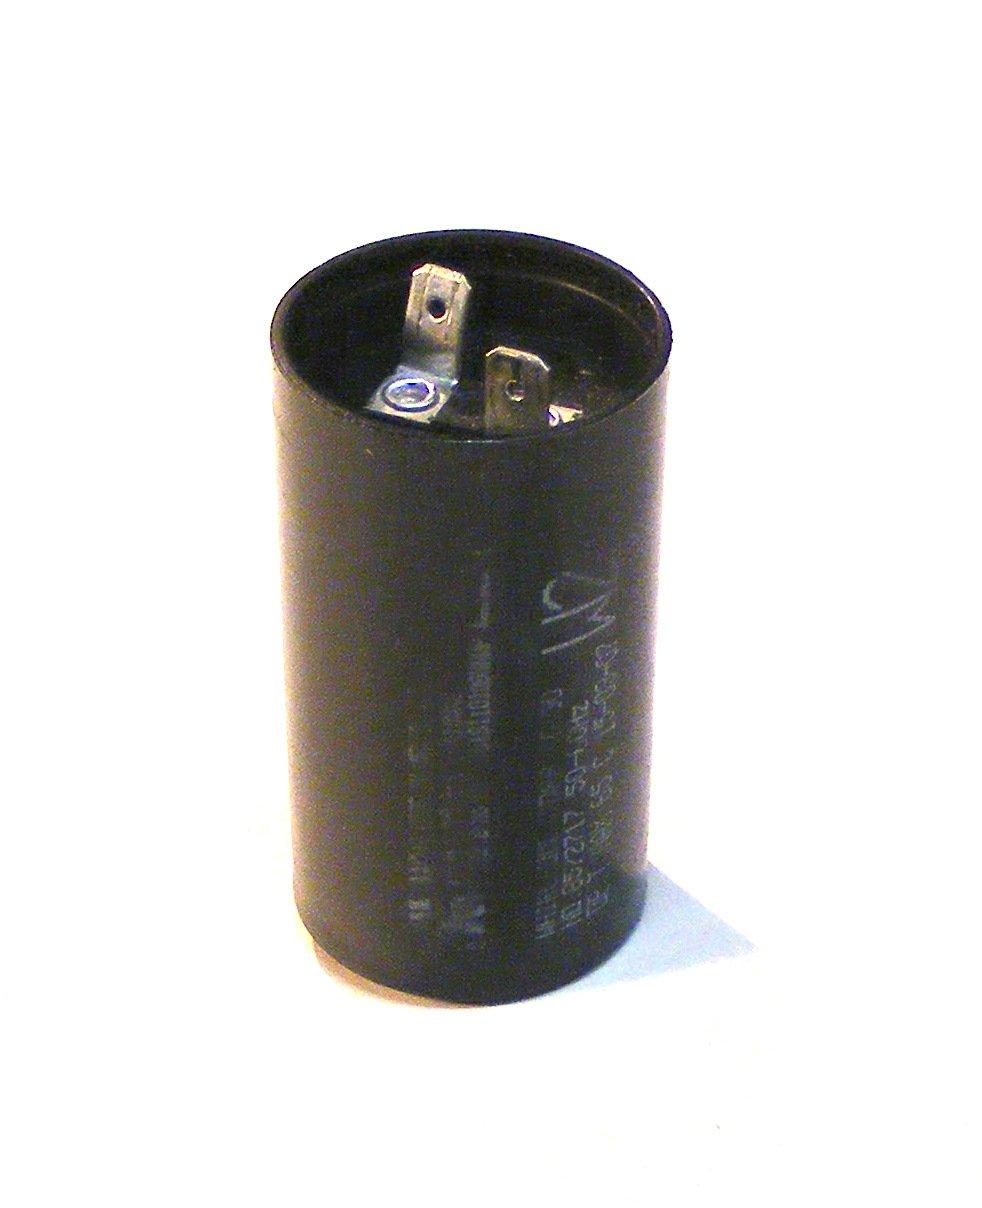 8572717 Whirlpool Washer Motor Start Capacitor Default Title Whirlpool Washer Capacitor Whirlpool